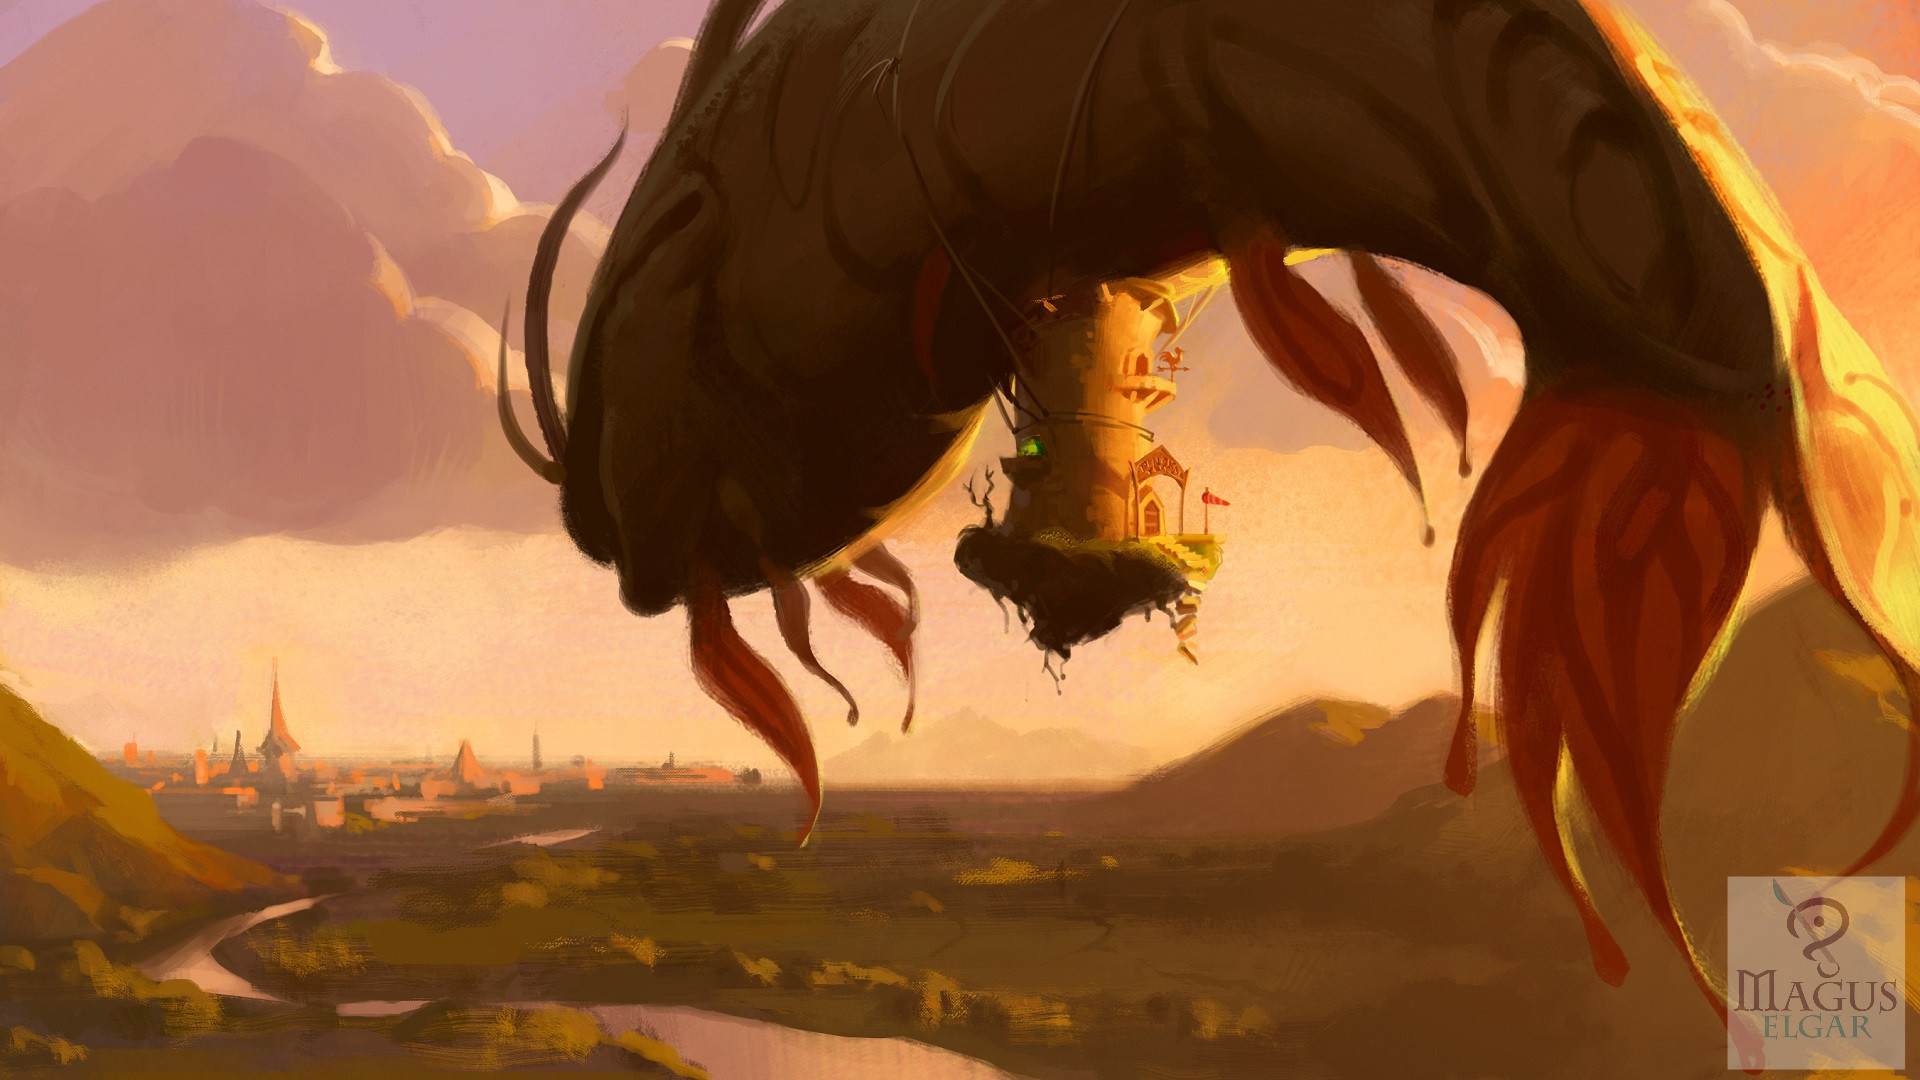 Pernorma Tower: Magus Sagari's Mediocre Trip